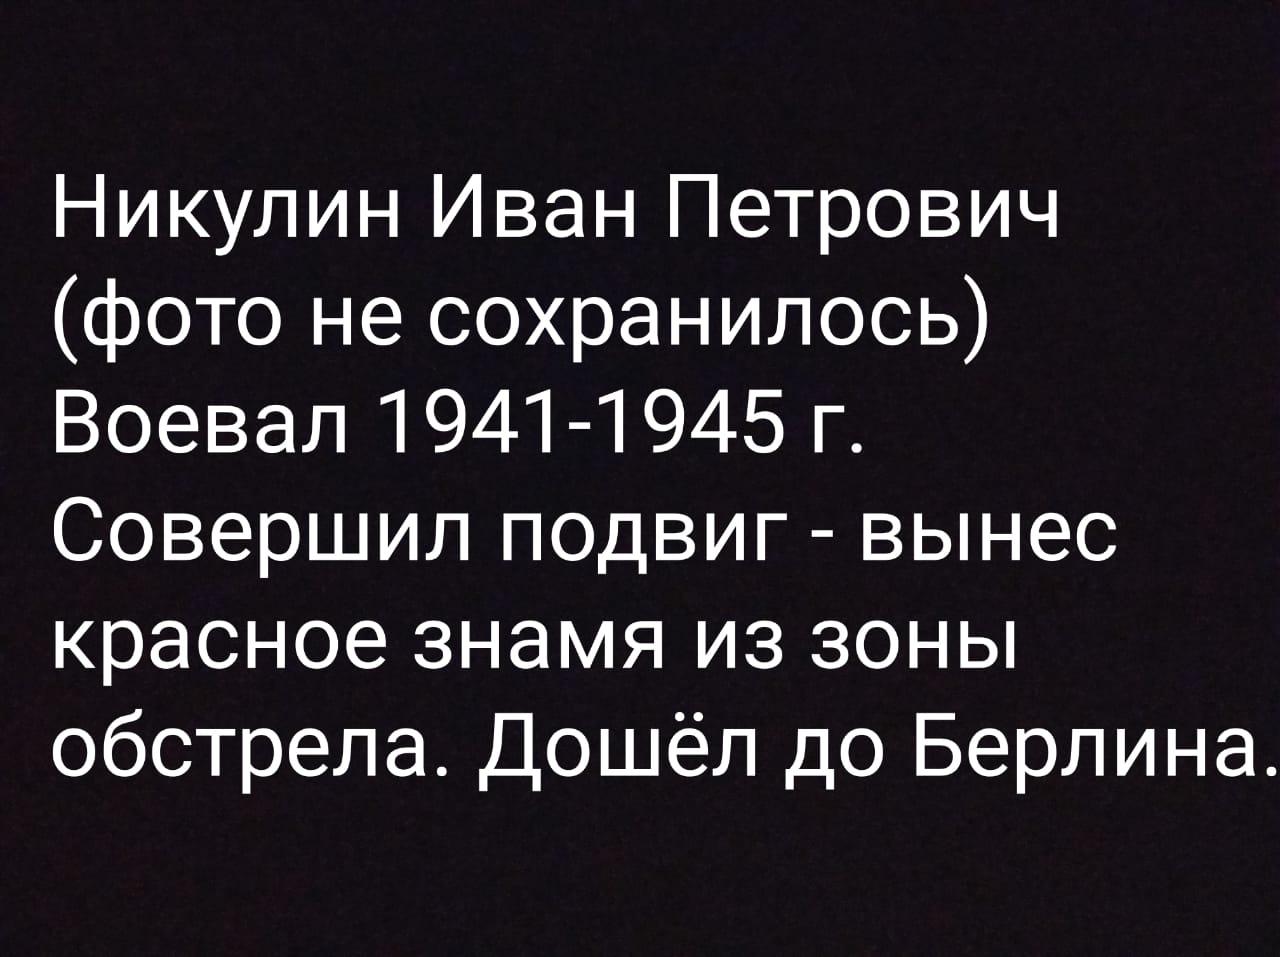 http://vrnschool85.ucoz.ru/19-20/E242B863-BFC6-4C90-B8F3-05792F1BCC44.jpeg